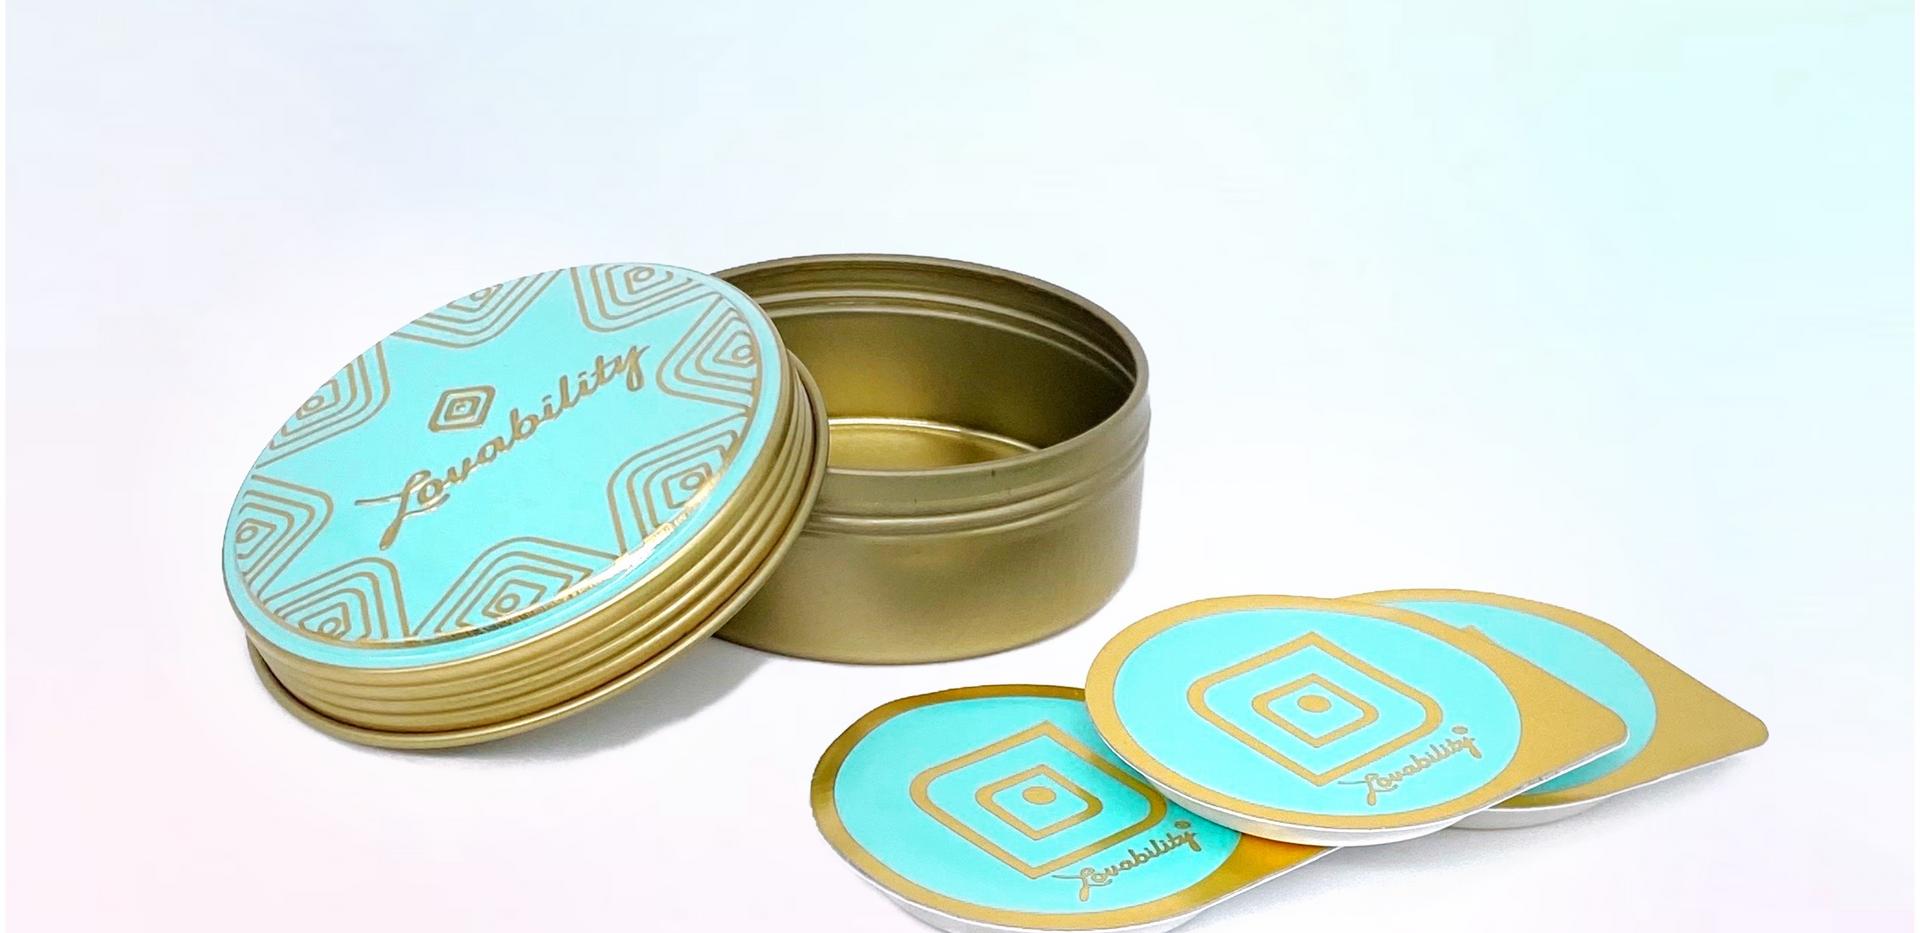 3 Condoms and a Tin - Lovability